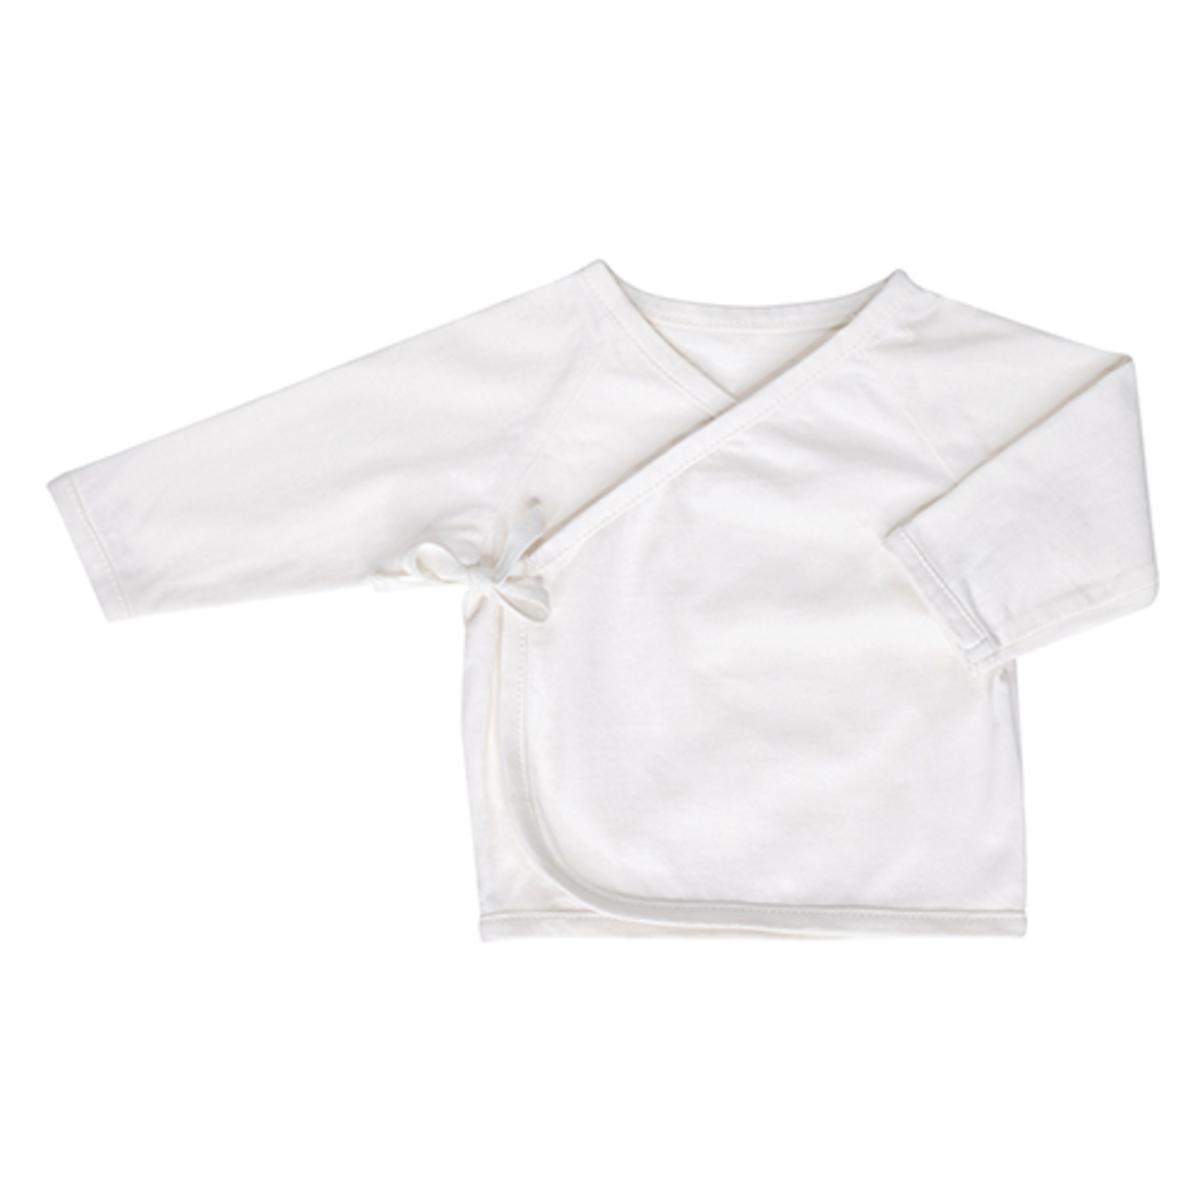 Haut bébé Cardigan Kimono Cream - 6 Mois Cardigan Kimono Cream - 6 Mois